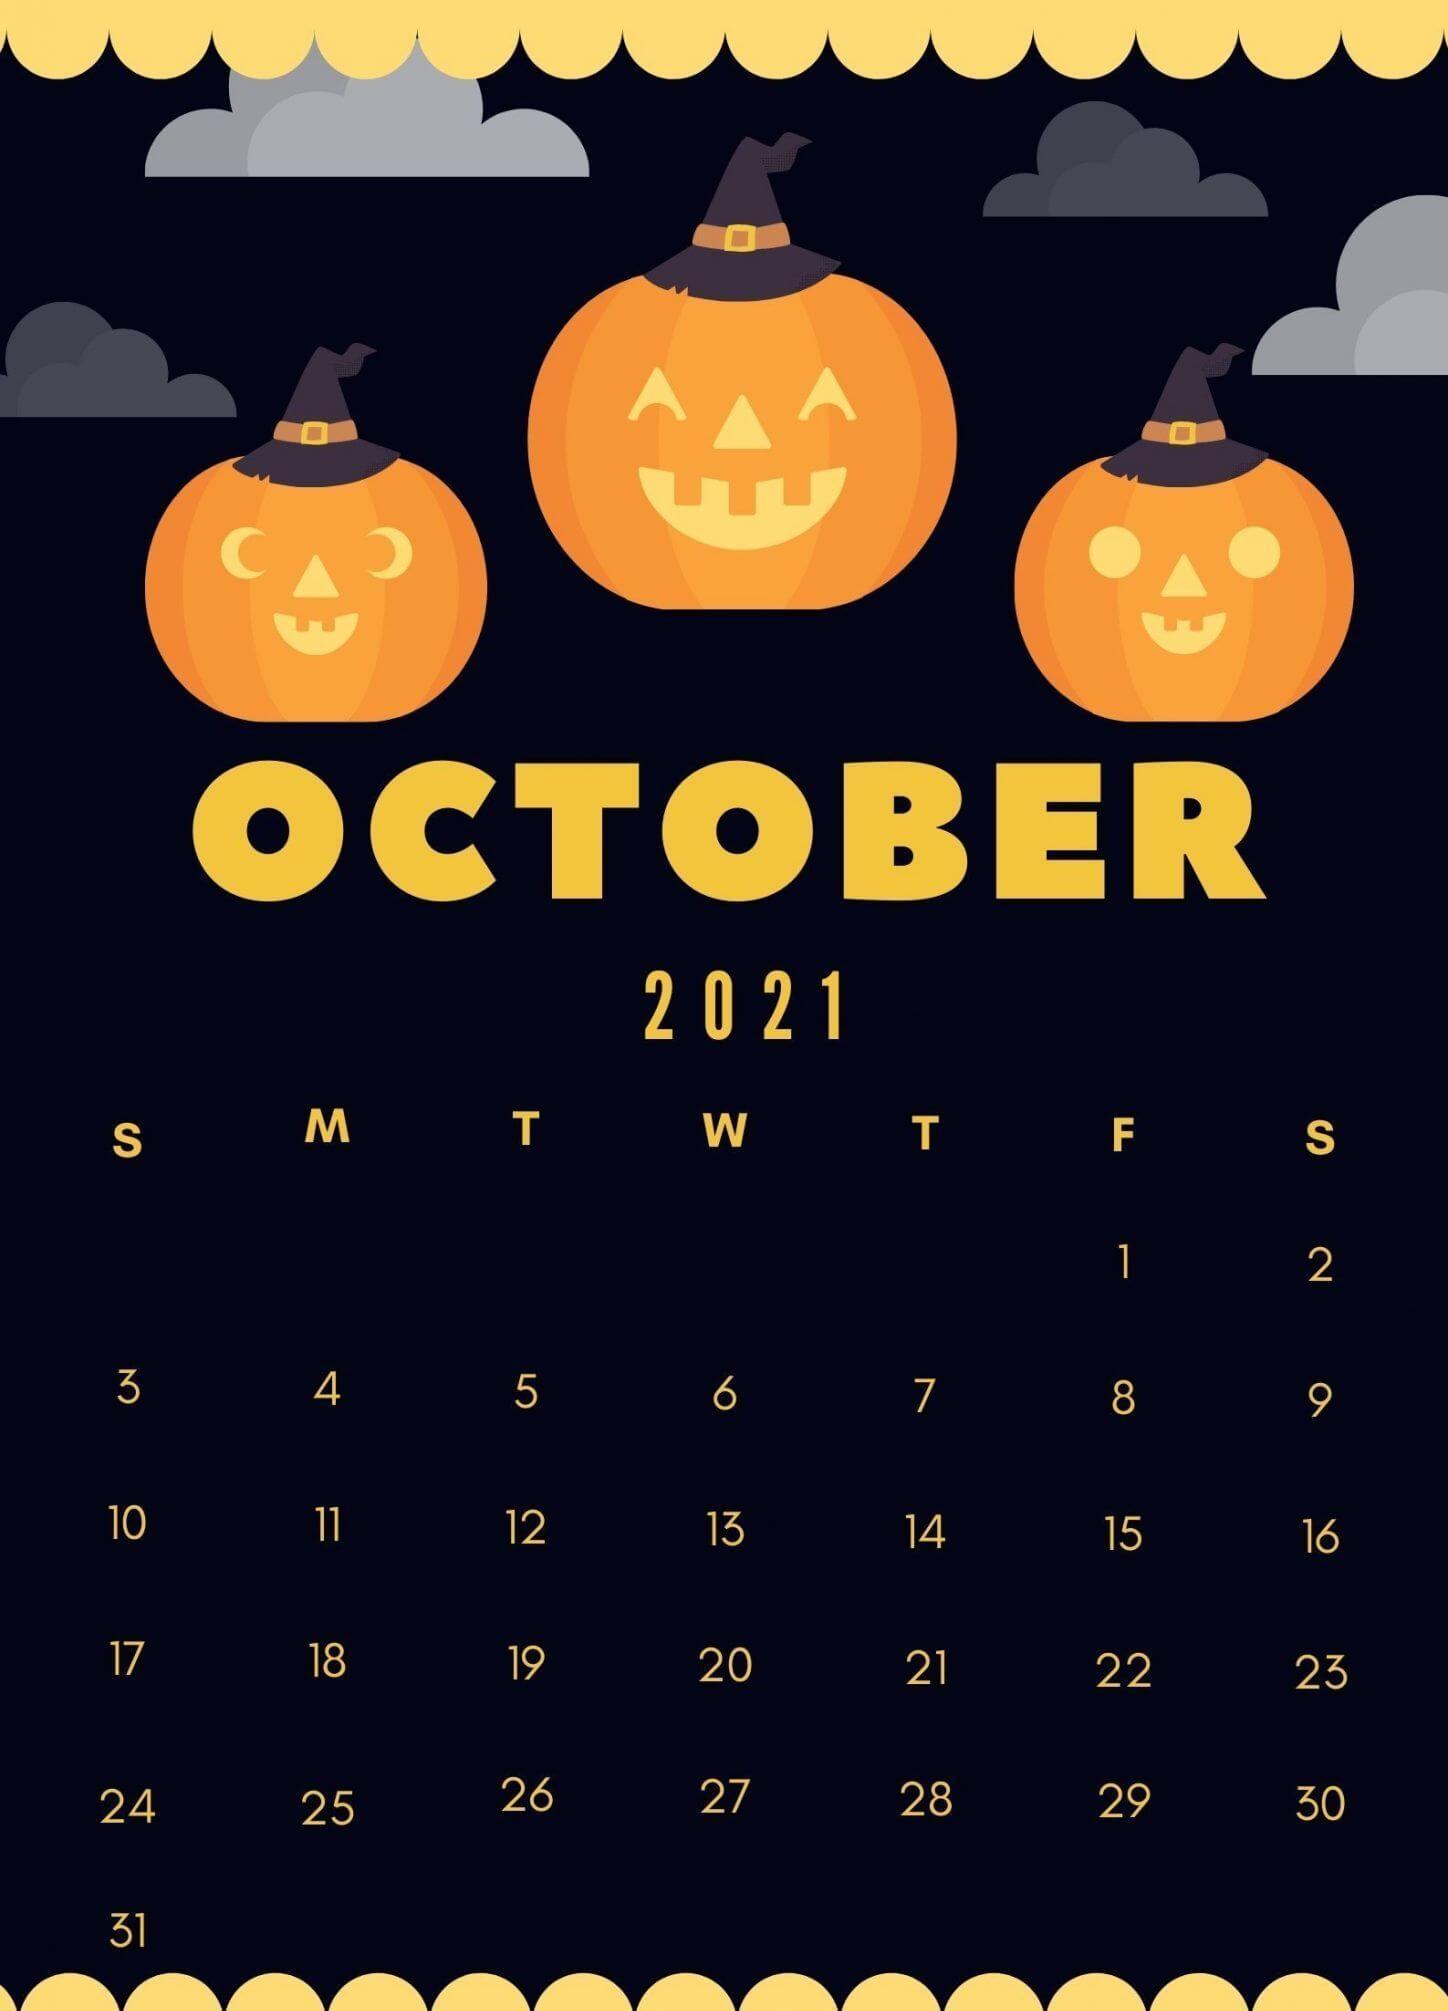 October 2021 Cute Calendar Design